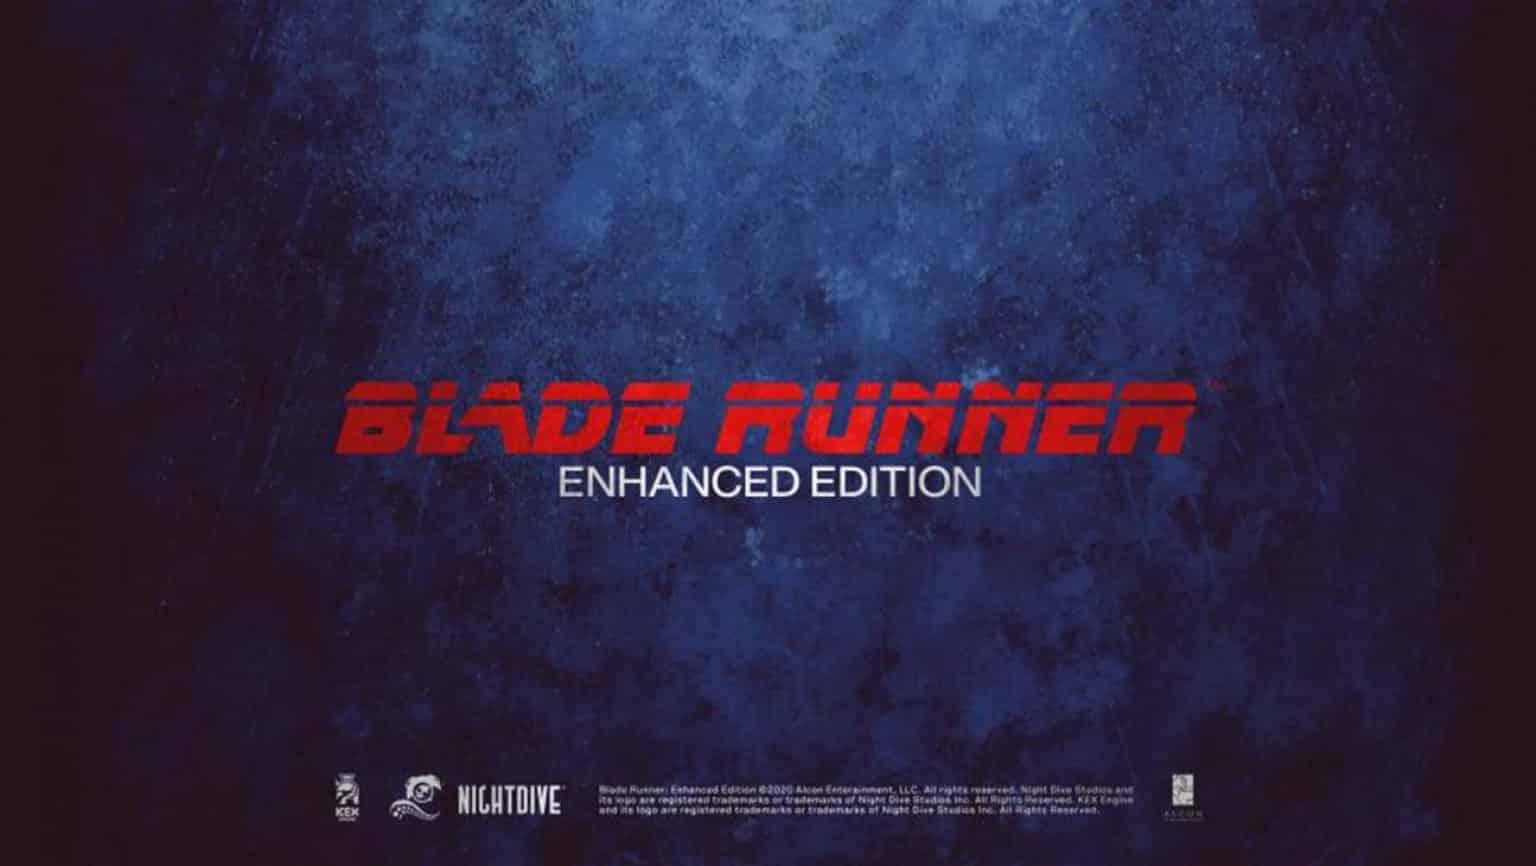 Blade Runner Enhanced Edition Nightdive Studios Westwood Studios Ridley Scott